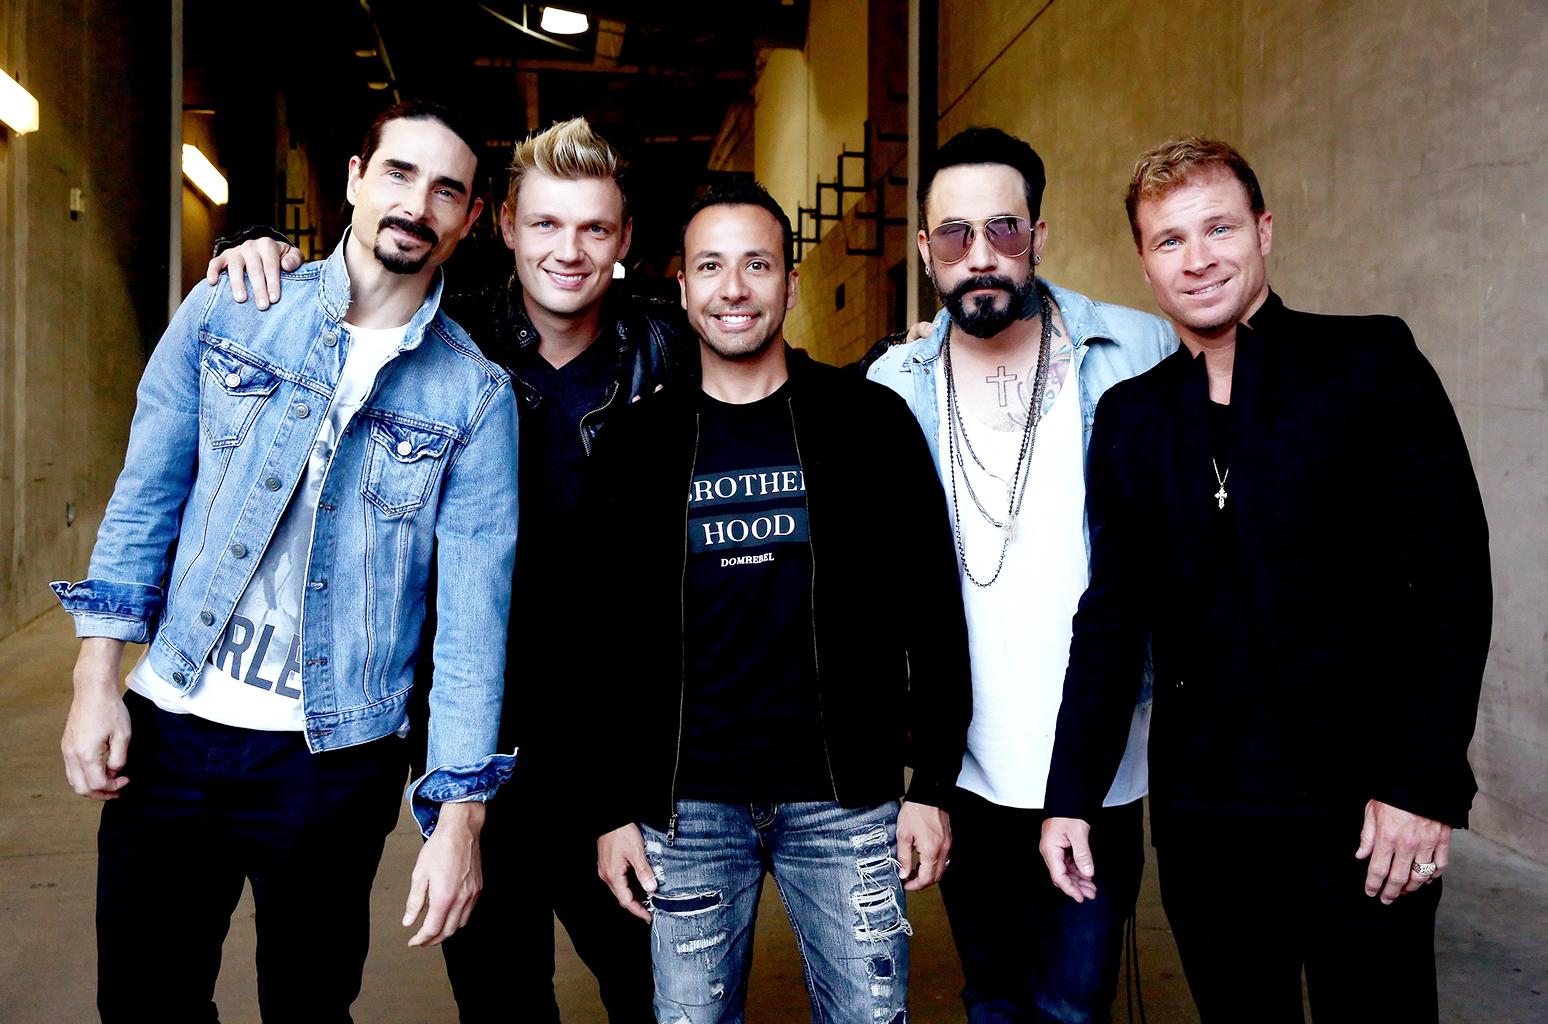 Backstreet Boys(バックストリート・ボーイズ)のプロフィール・バイオグラフィーまとめ